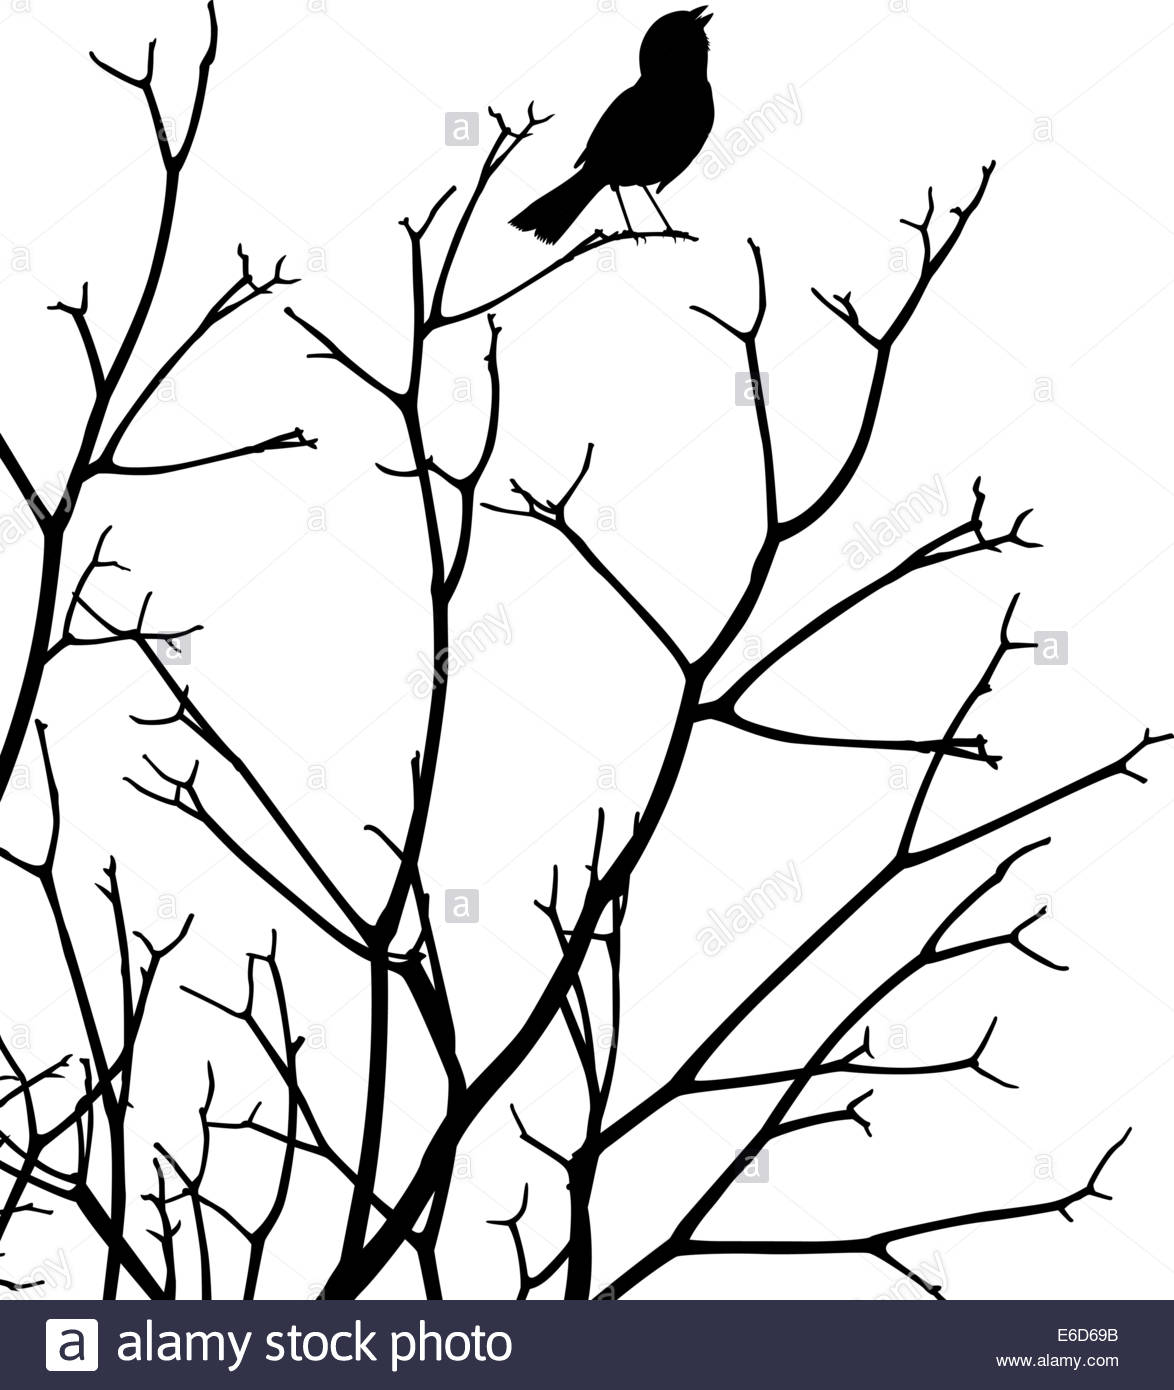 1174x1390 Editable Vector Silhouette Of A Bird Singing